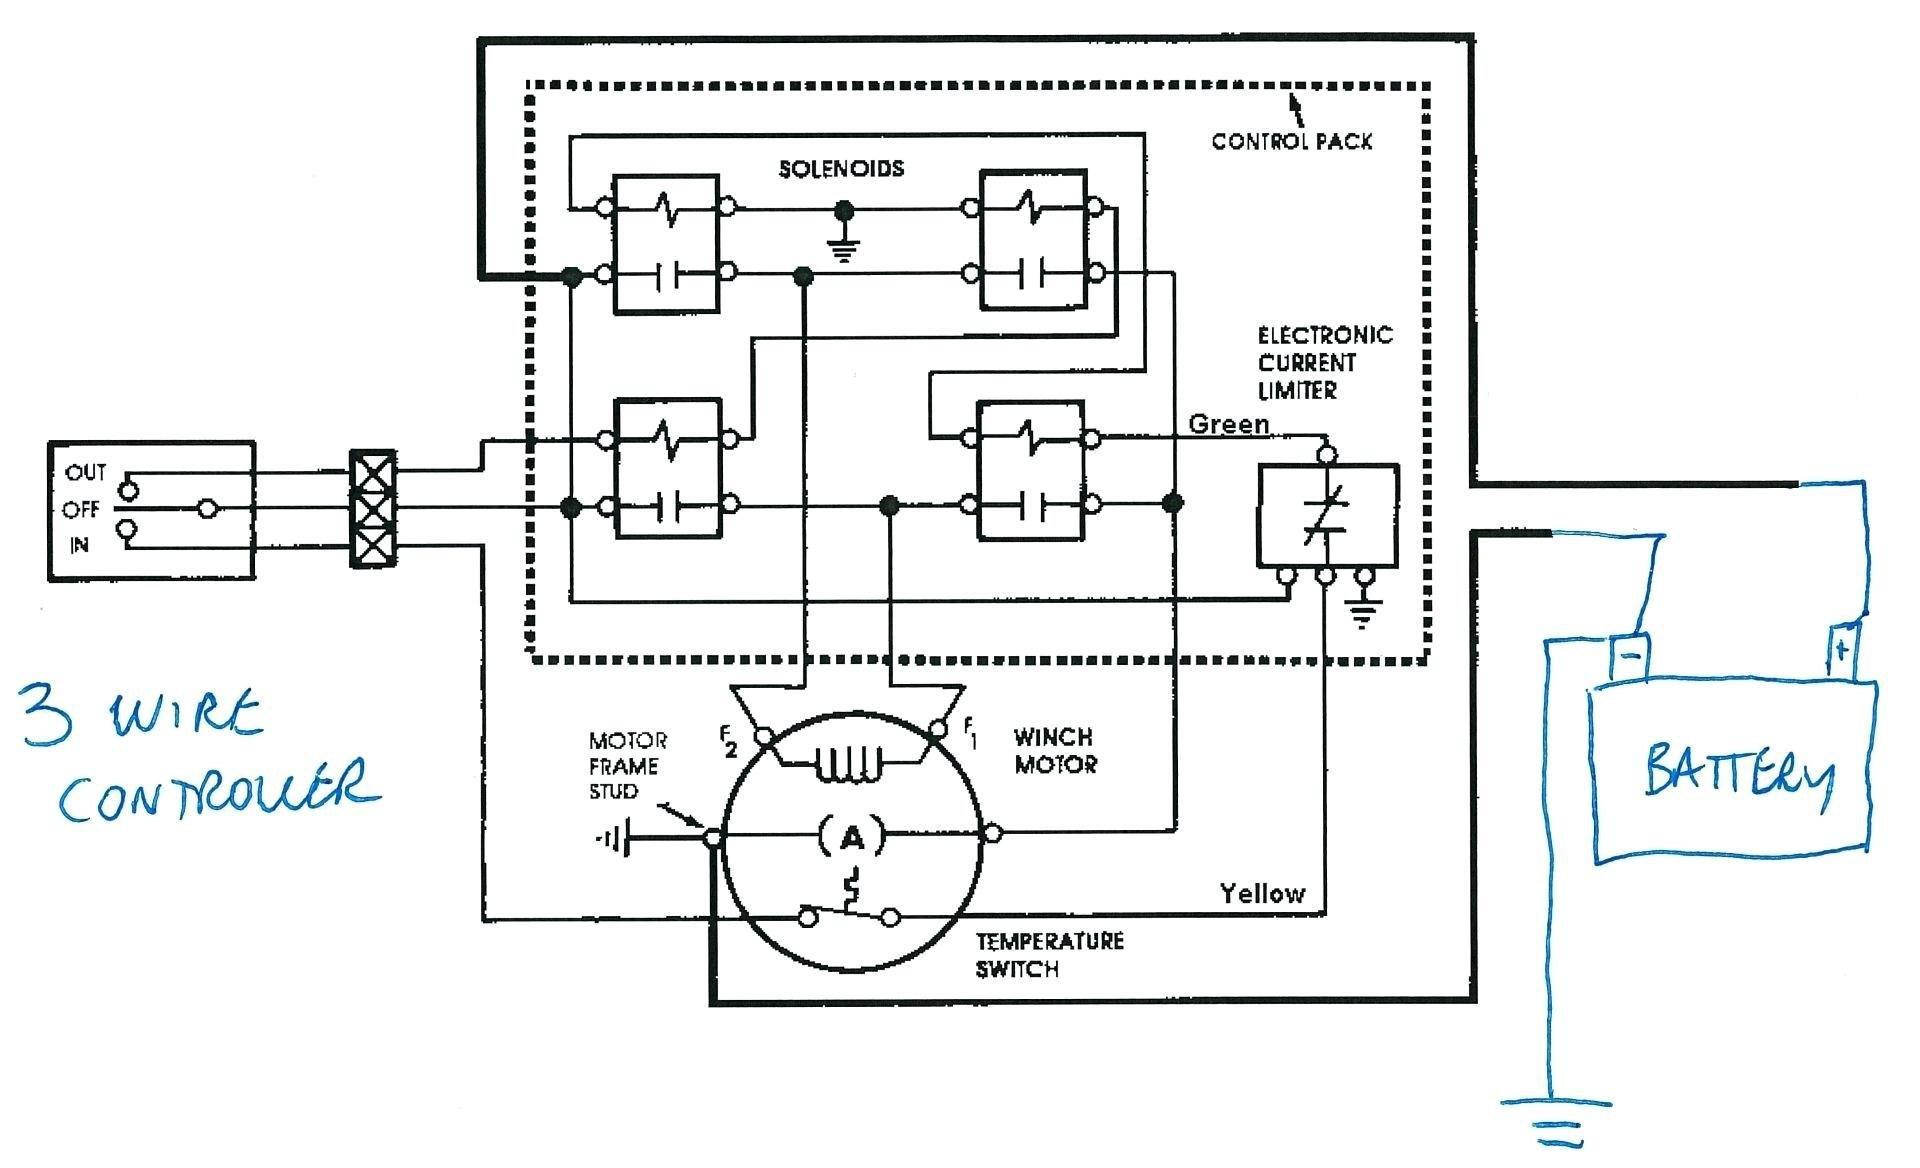 Lighting Contactors Wiring Diagrams | Wiring Diagram - Square D 8903 Lighting Contactor Wiring Diagram